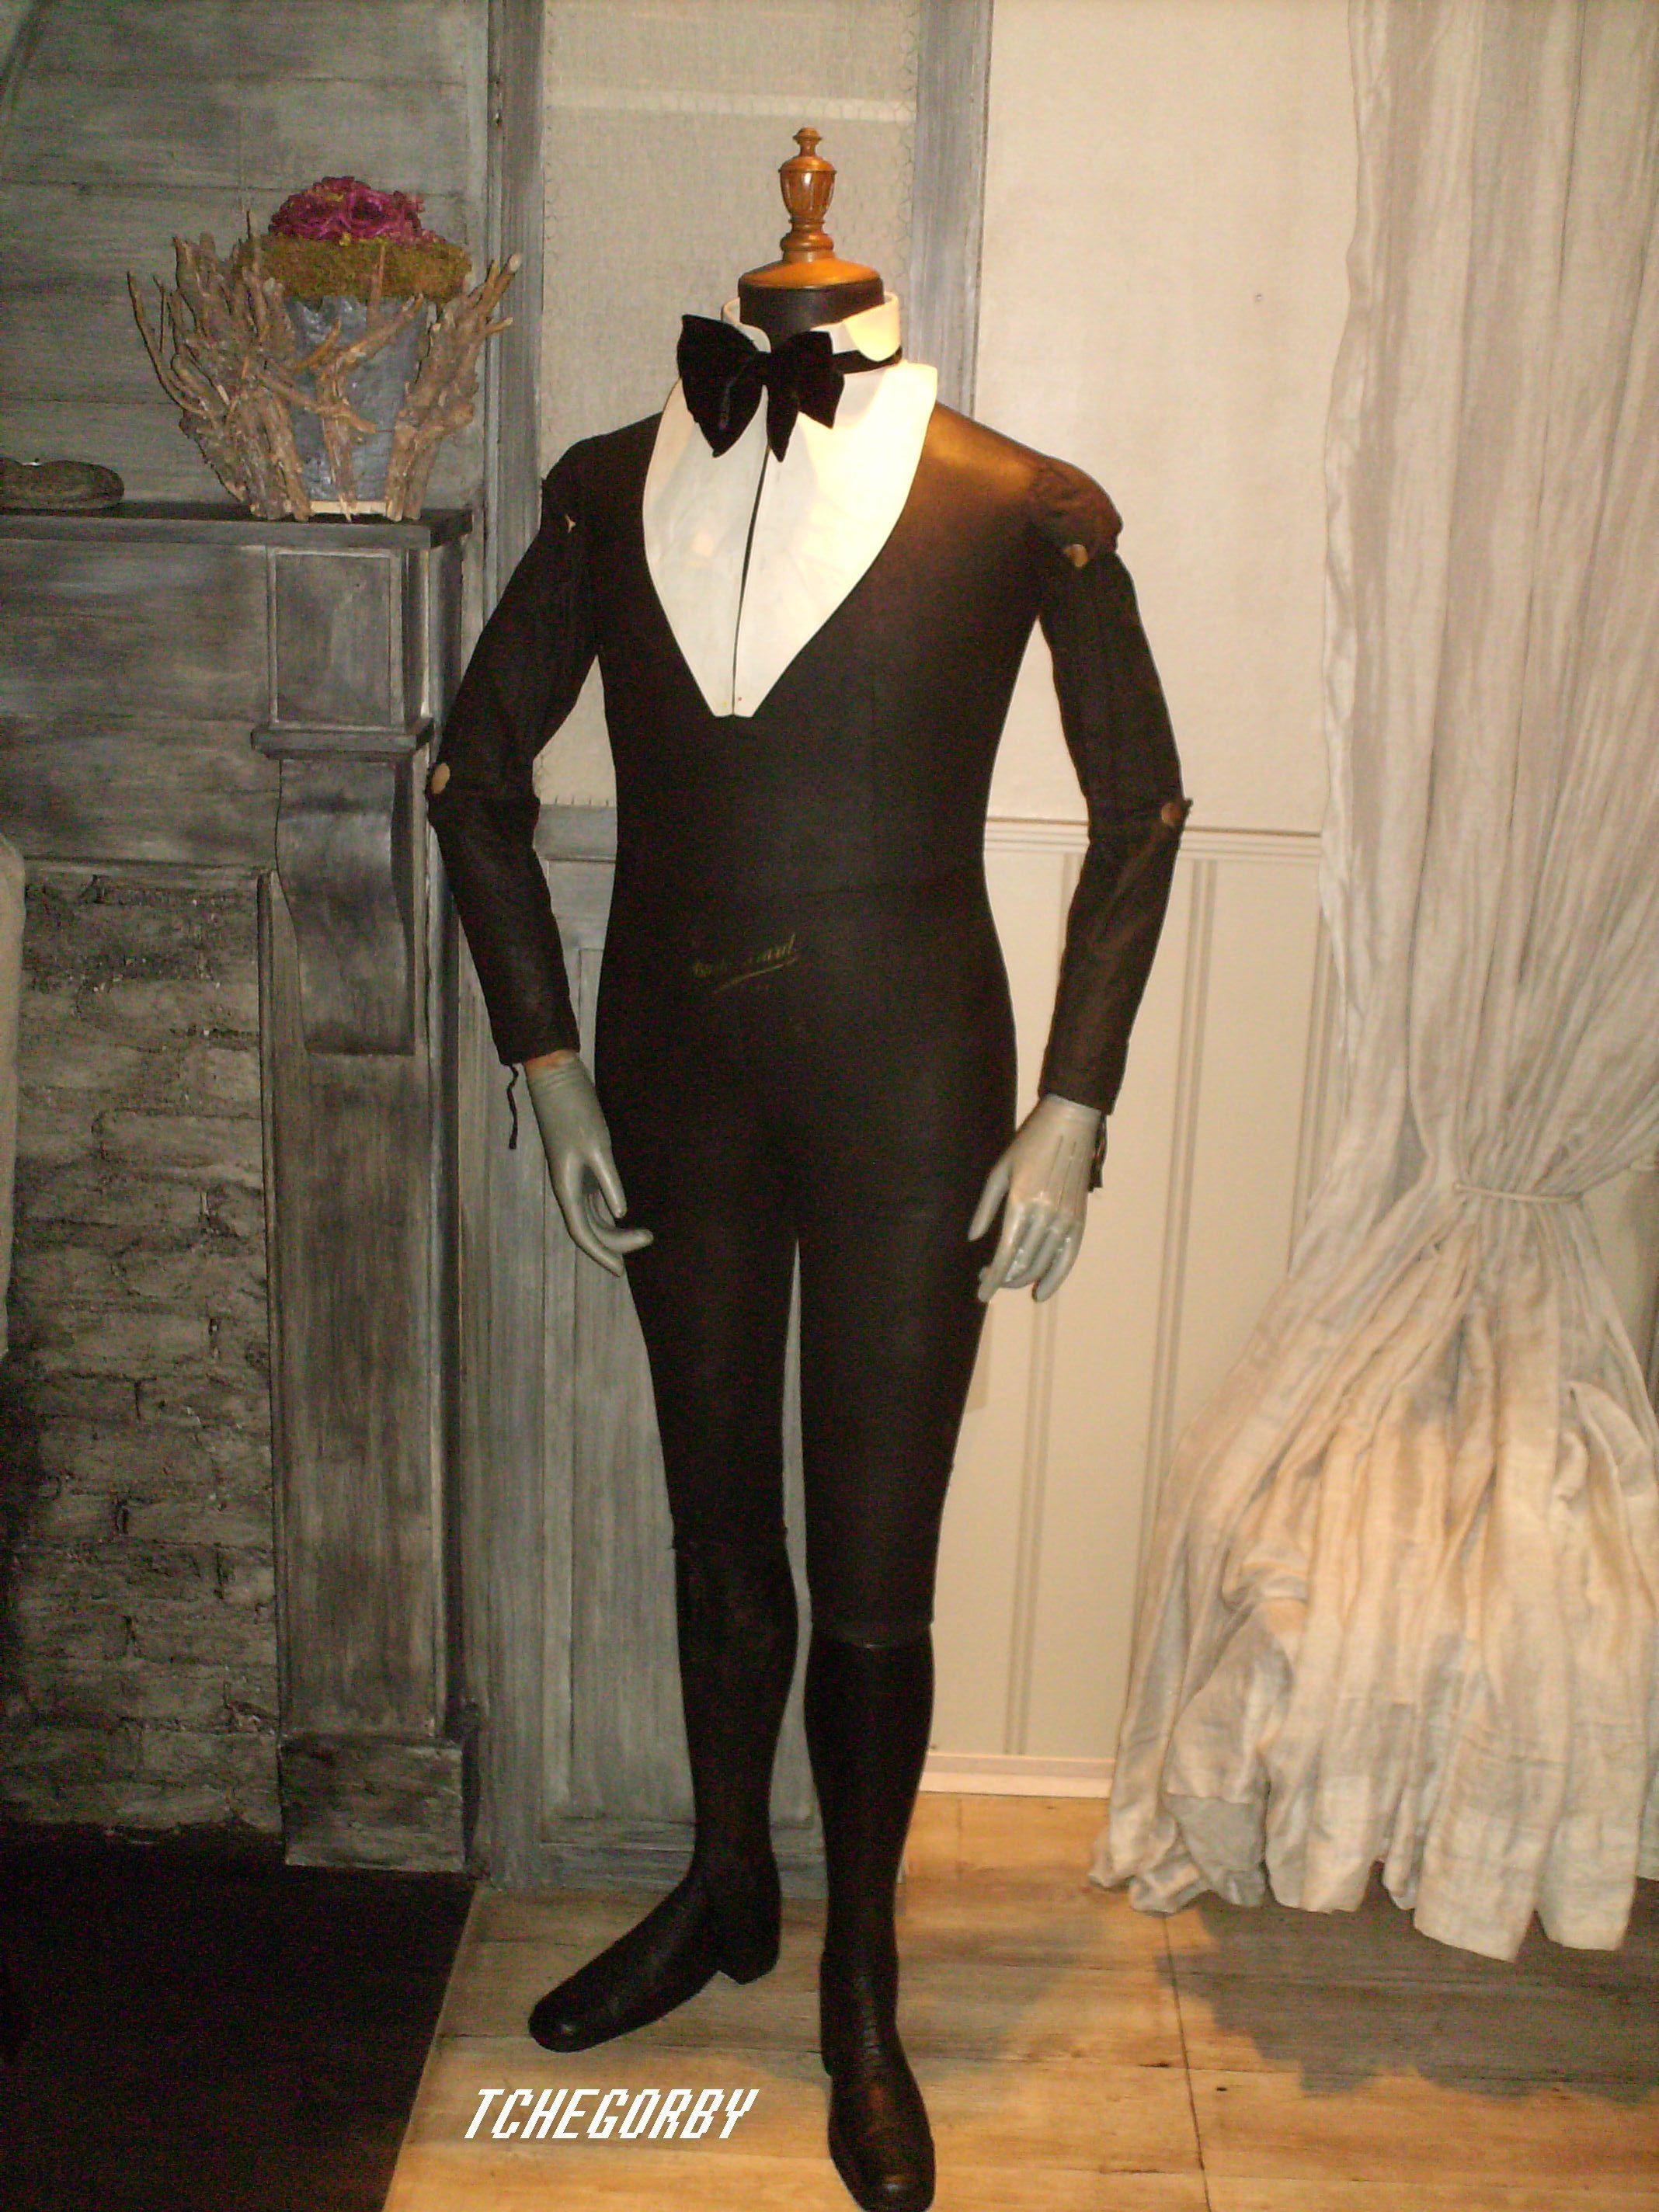 girard paris mannequin mannequins pinterest. Black Bedroom Furniture Sets. Home Design Ideas